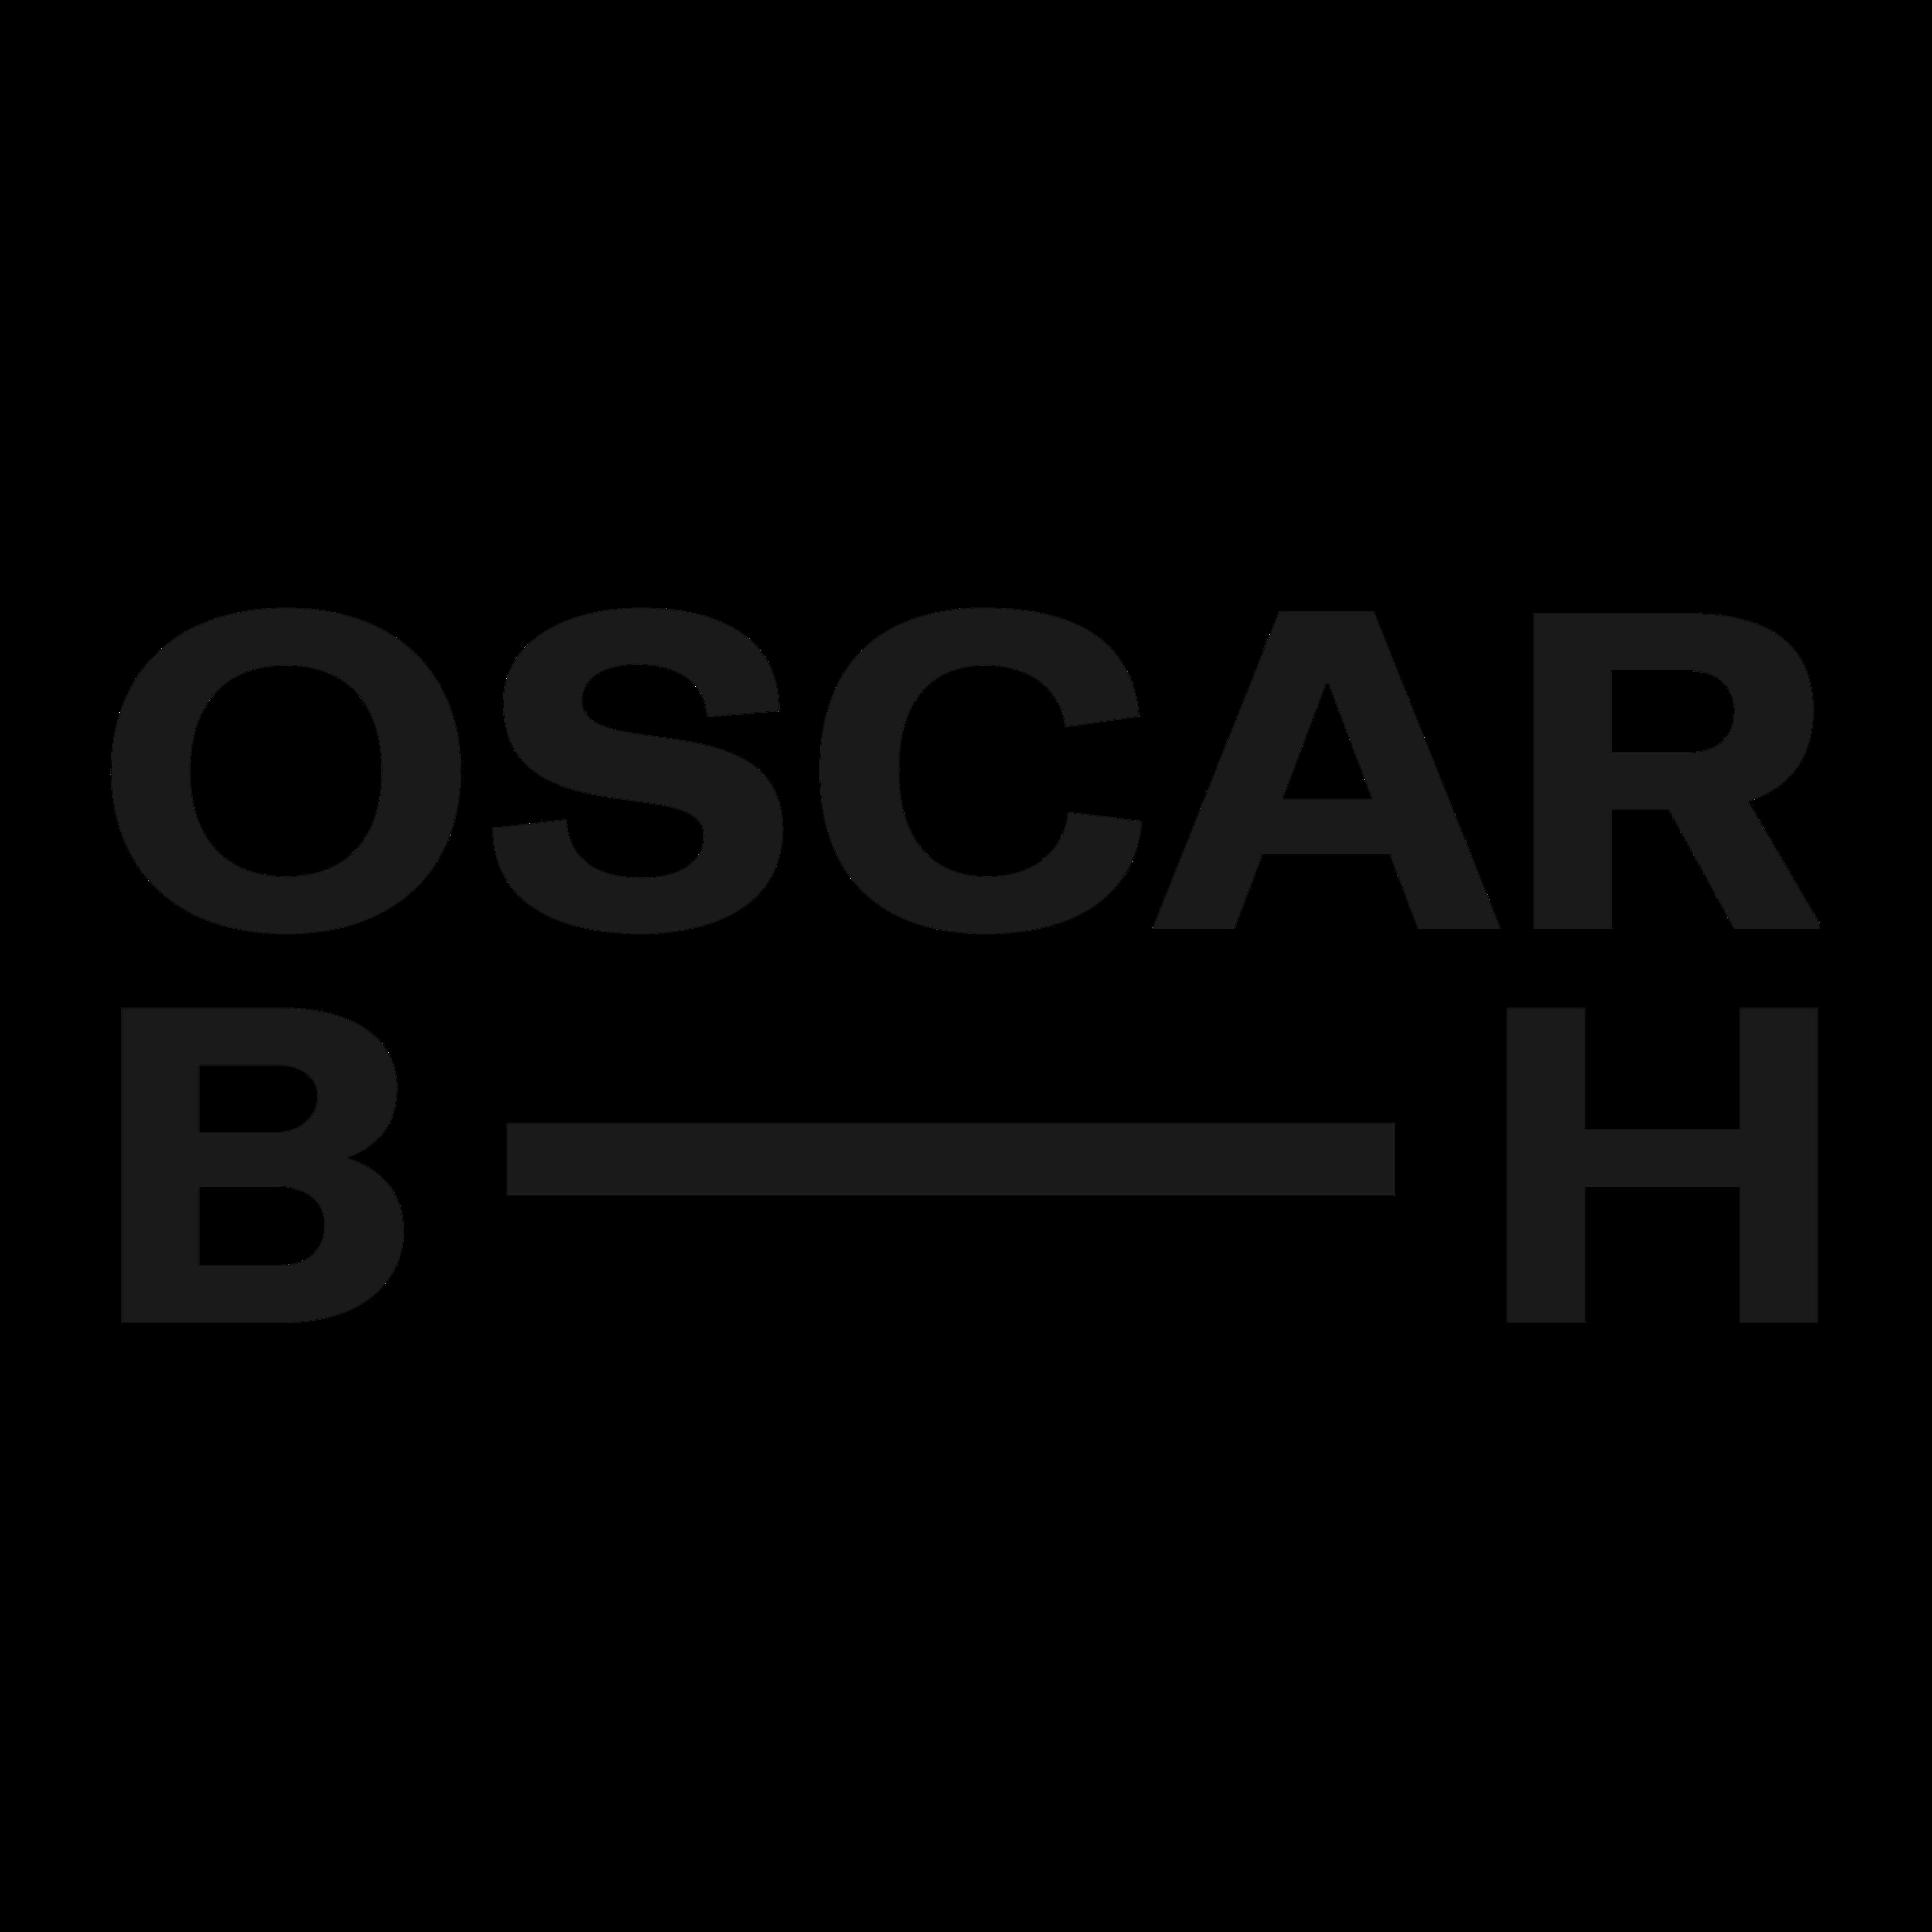 Oscar Briscall-Harvey